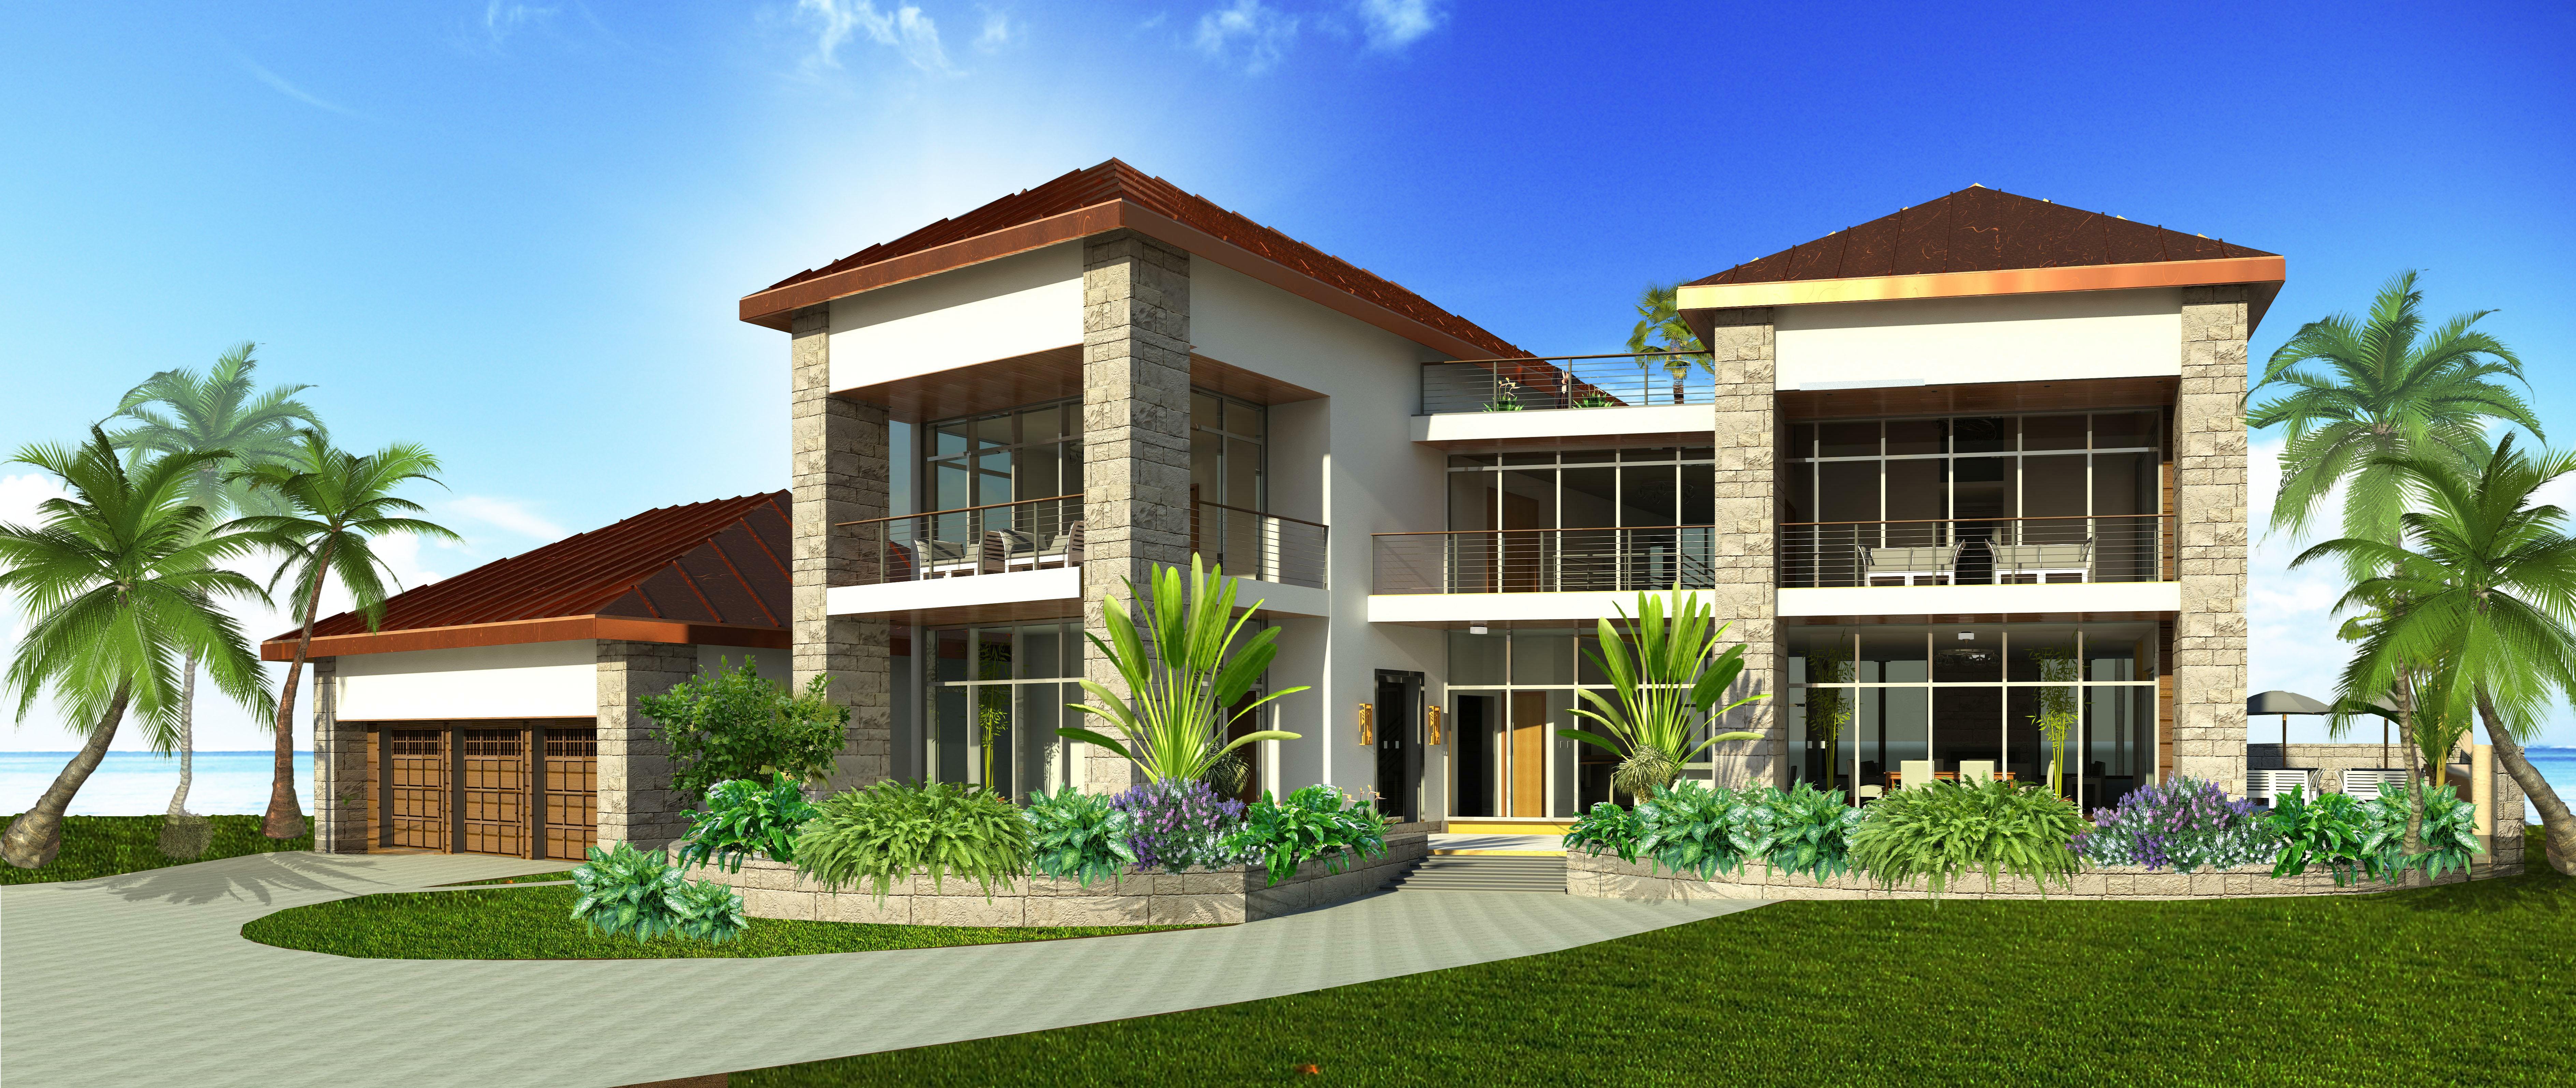 Ervin Architecture image 4